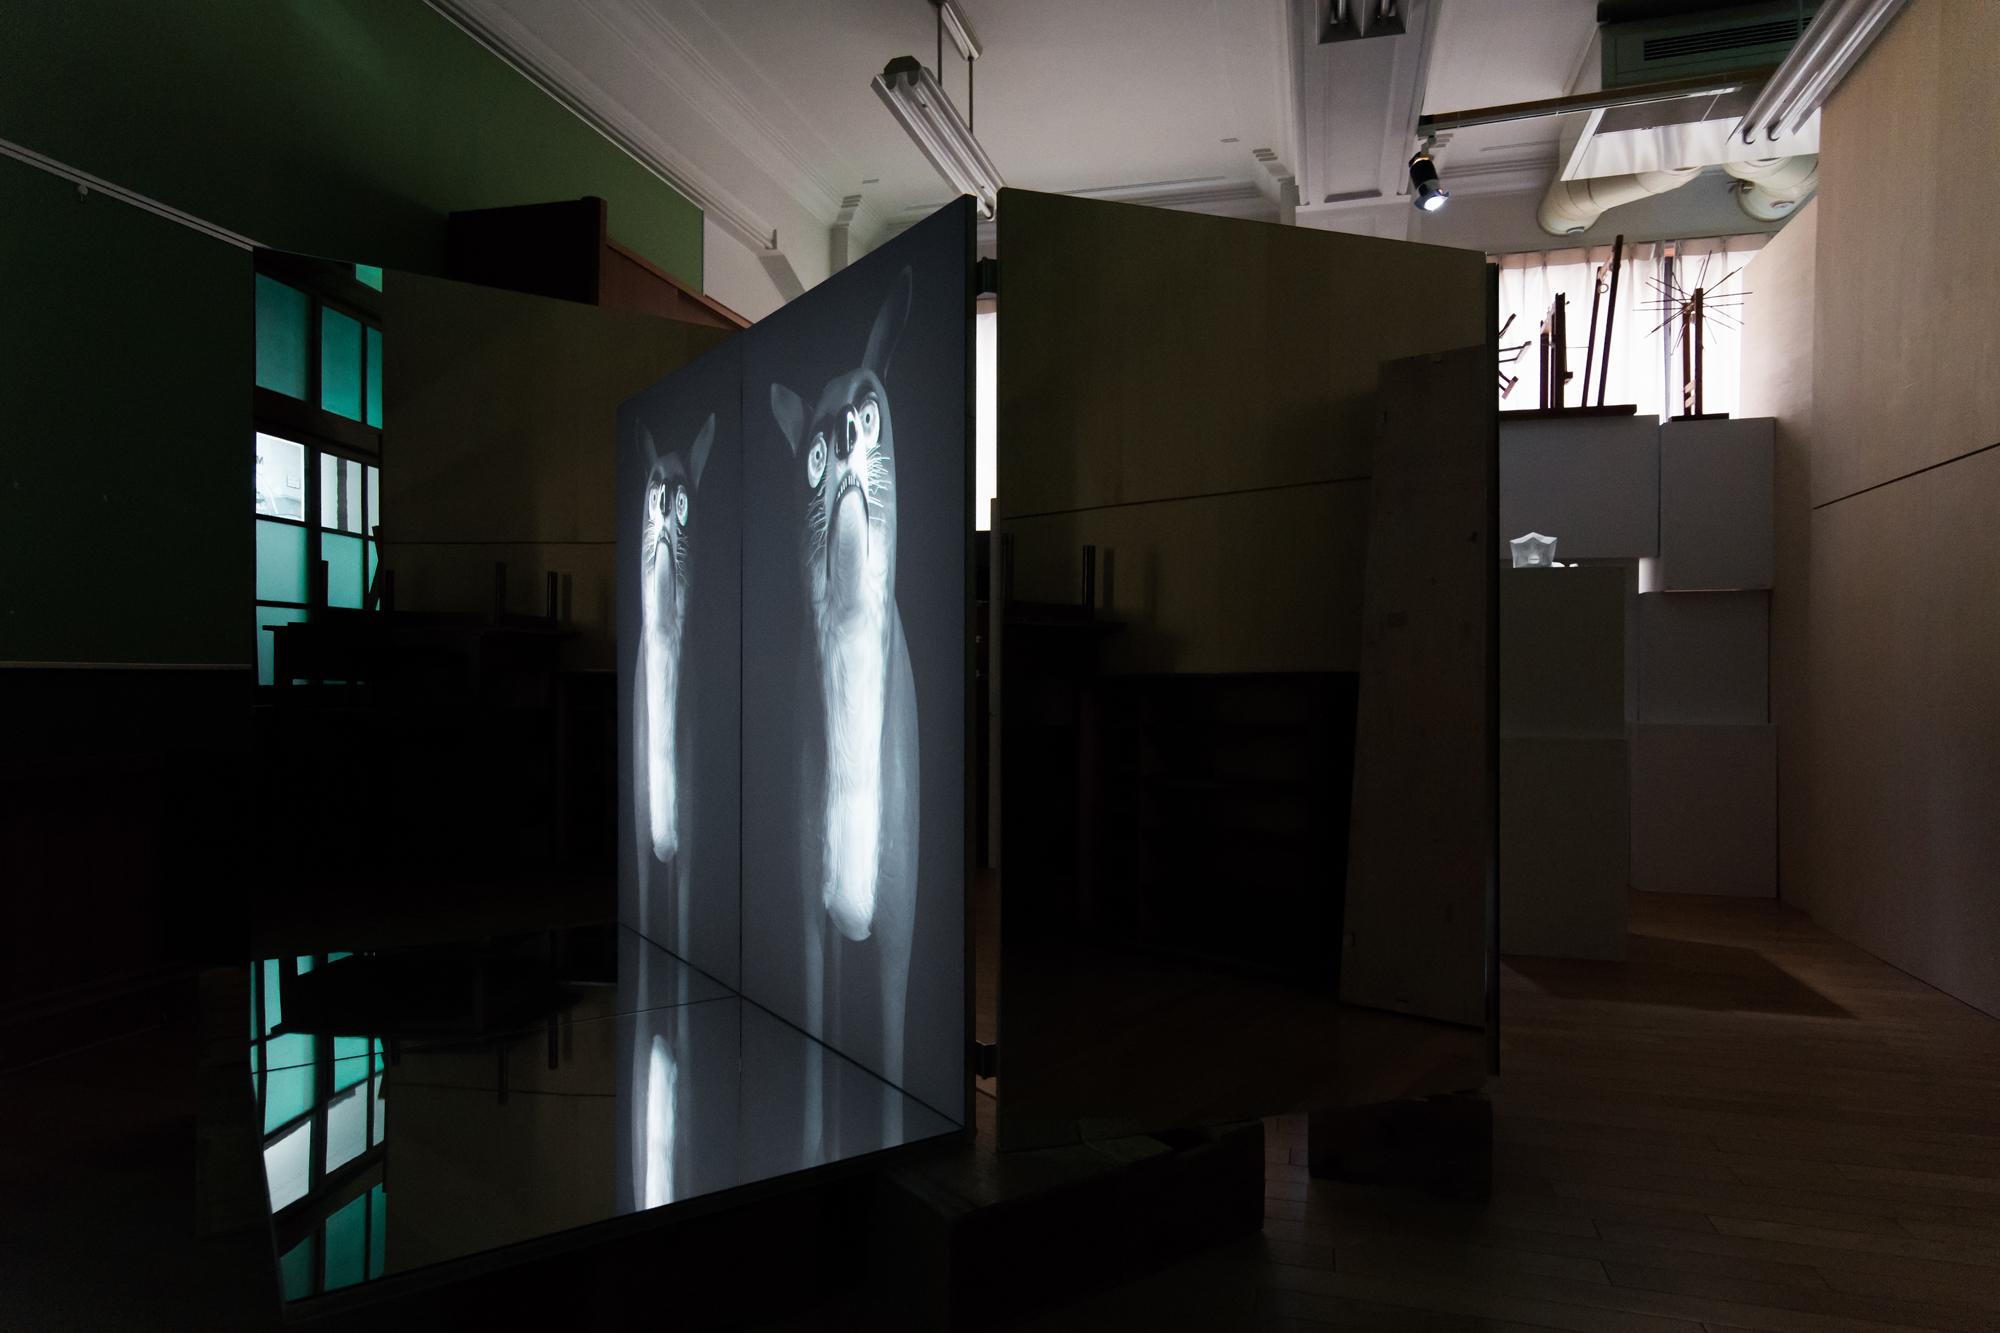 Ann Lislegaard, Time Machine, 2011. Installation view, Kyoto Art Center, 2015. Photo by Tetsuya Hayashiguchi. Courtesy of the artist and Murray Guy Gallery, New York